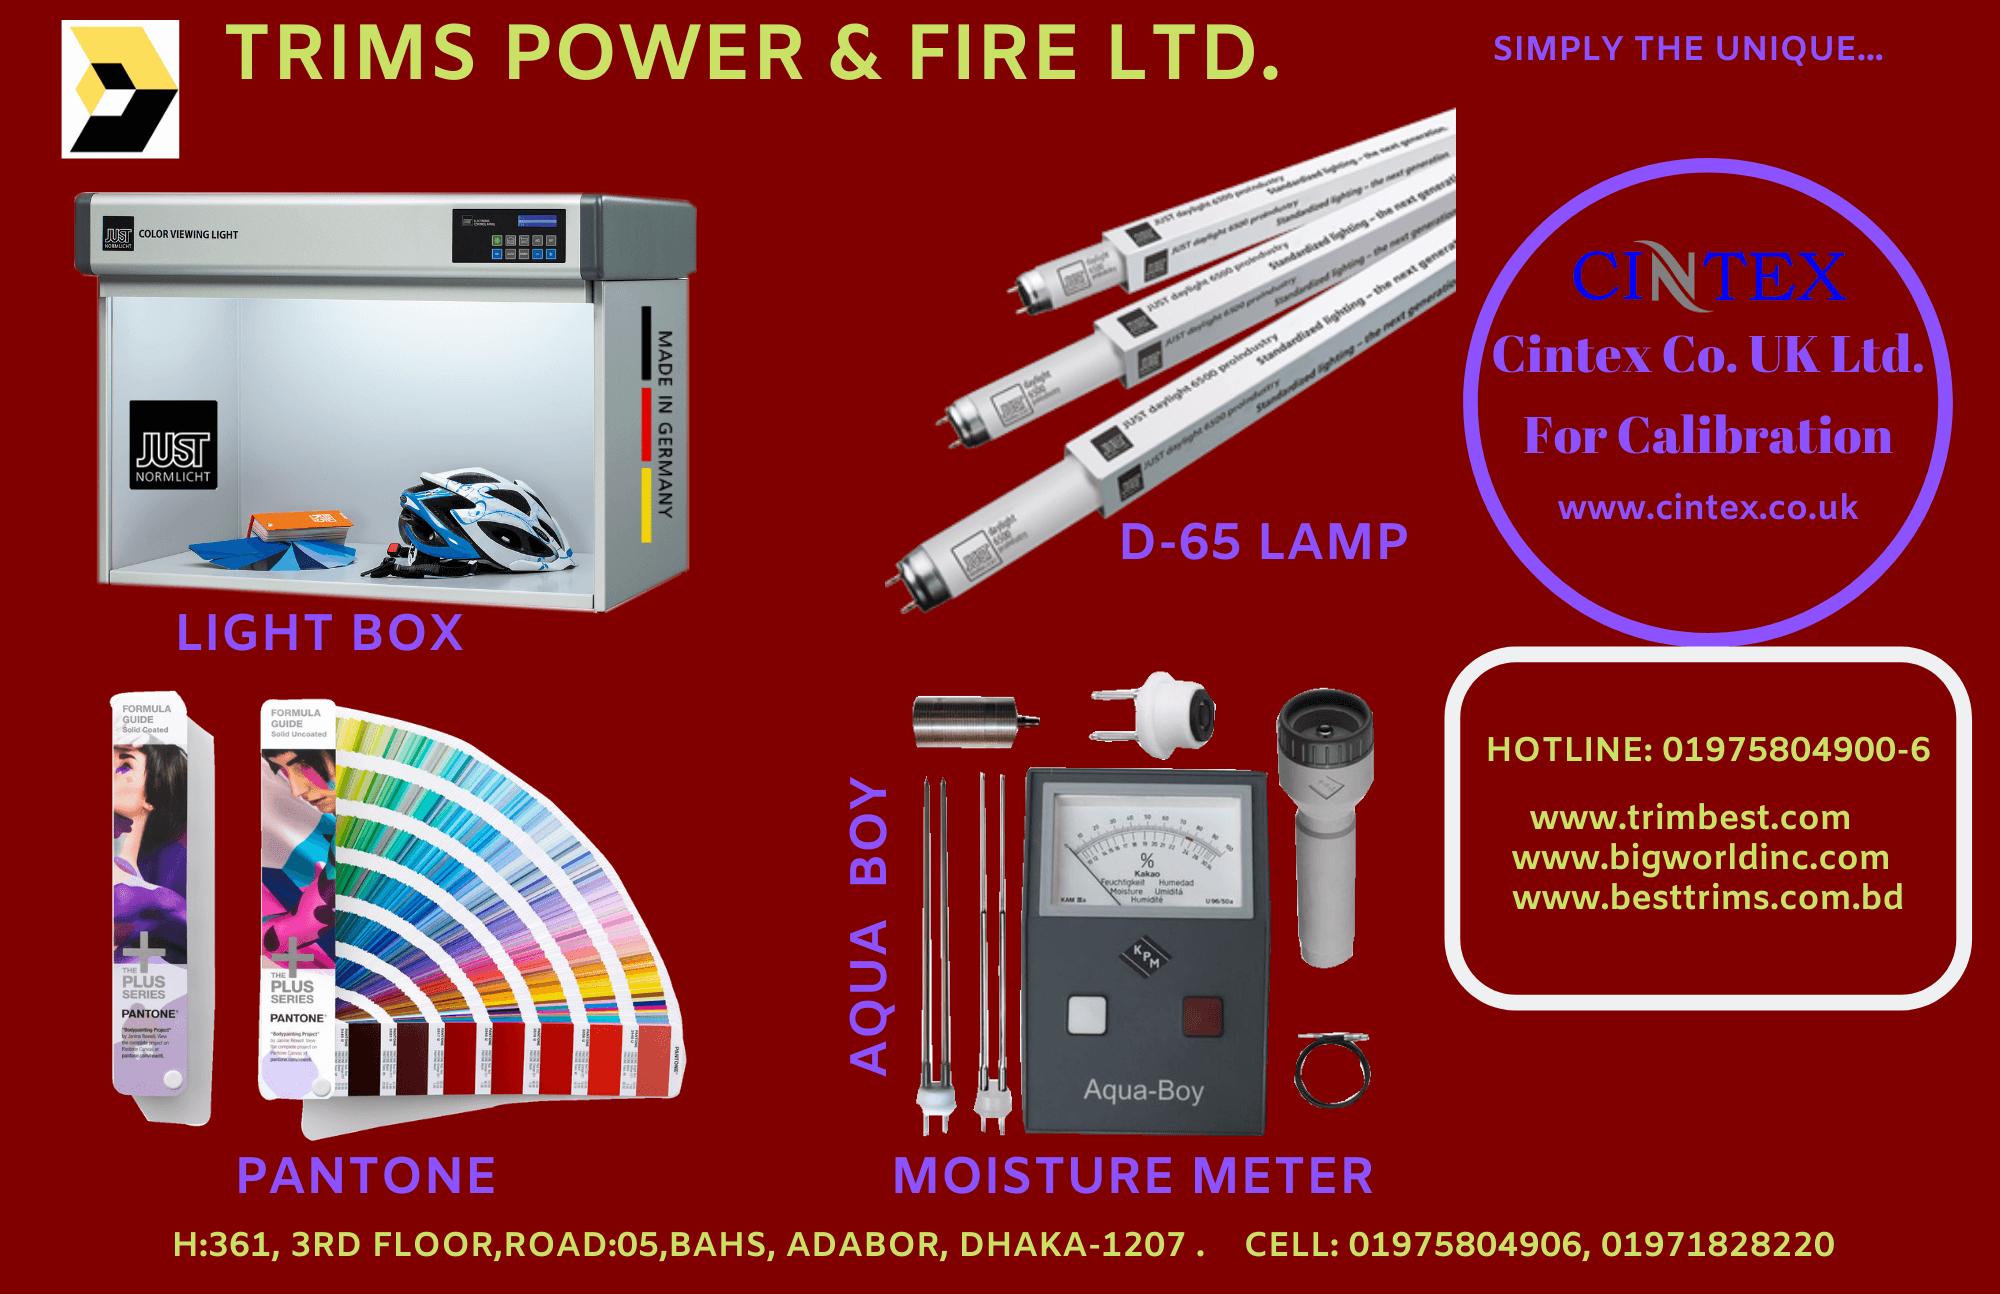 Lightbox D65 Lamp Pantone Moisture Meter Supplier Bangladesh